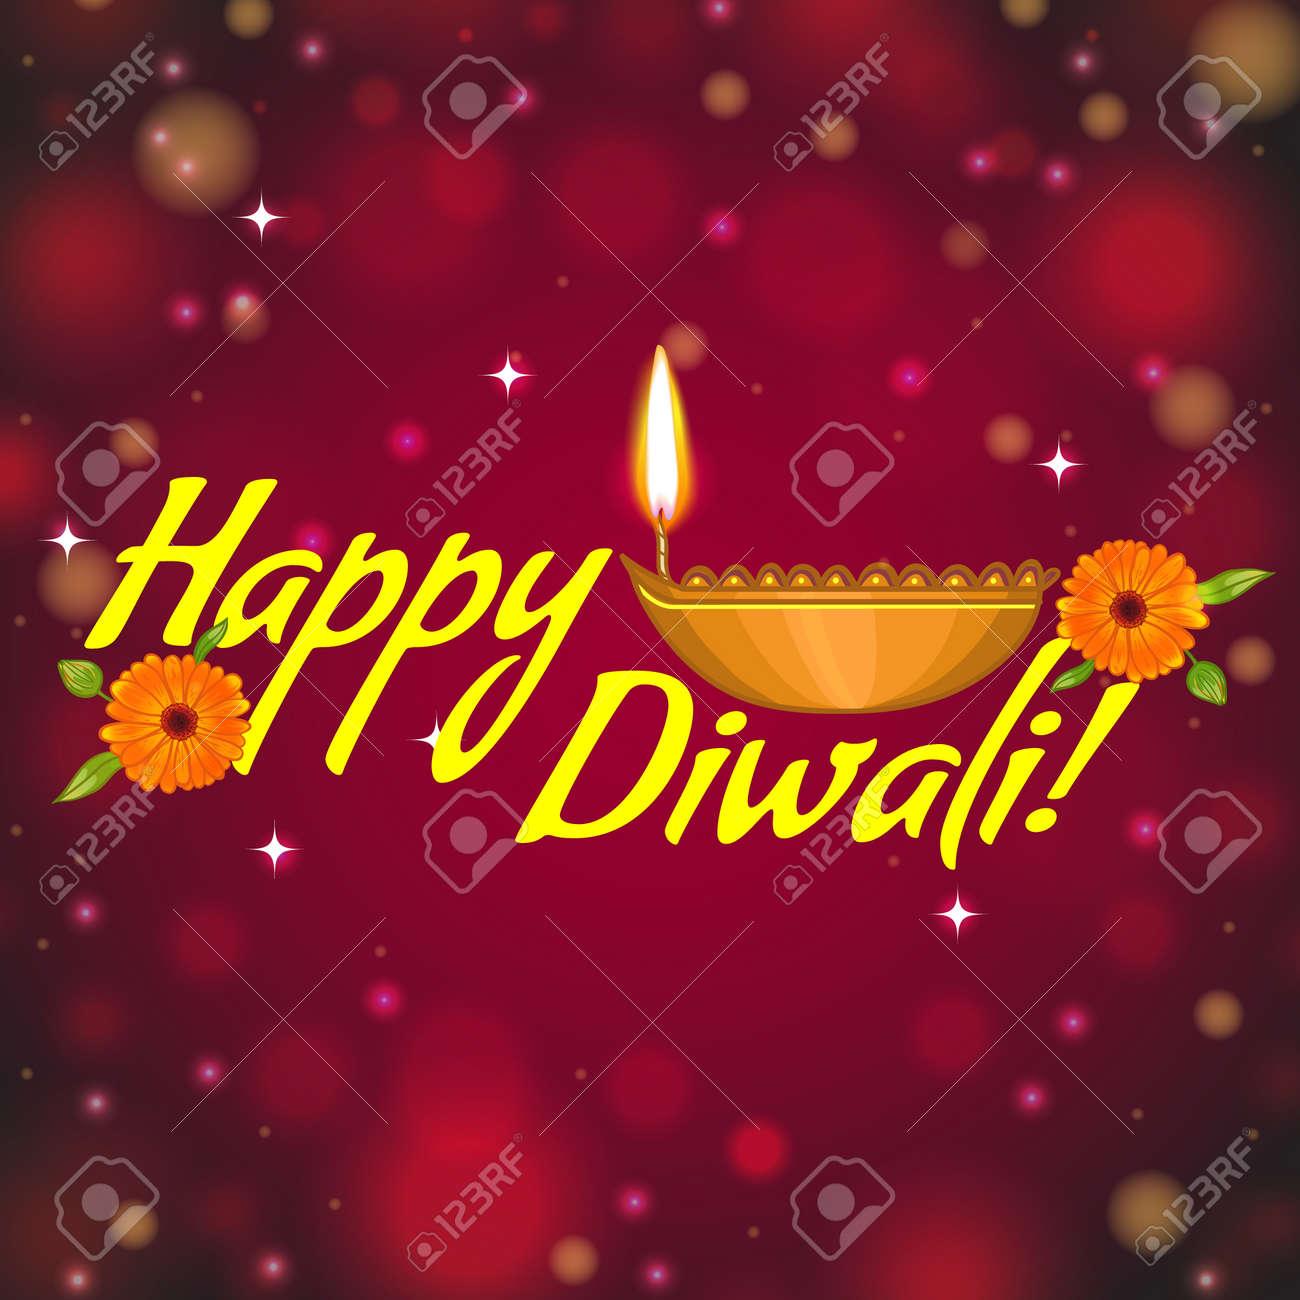 Greeting Card For Diwali With Diya Decoration Royalty Free Cliparts